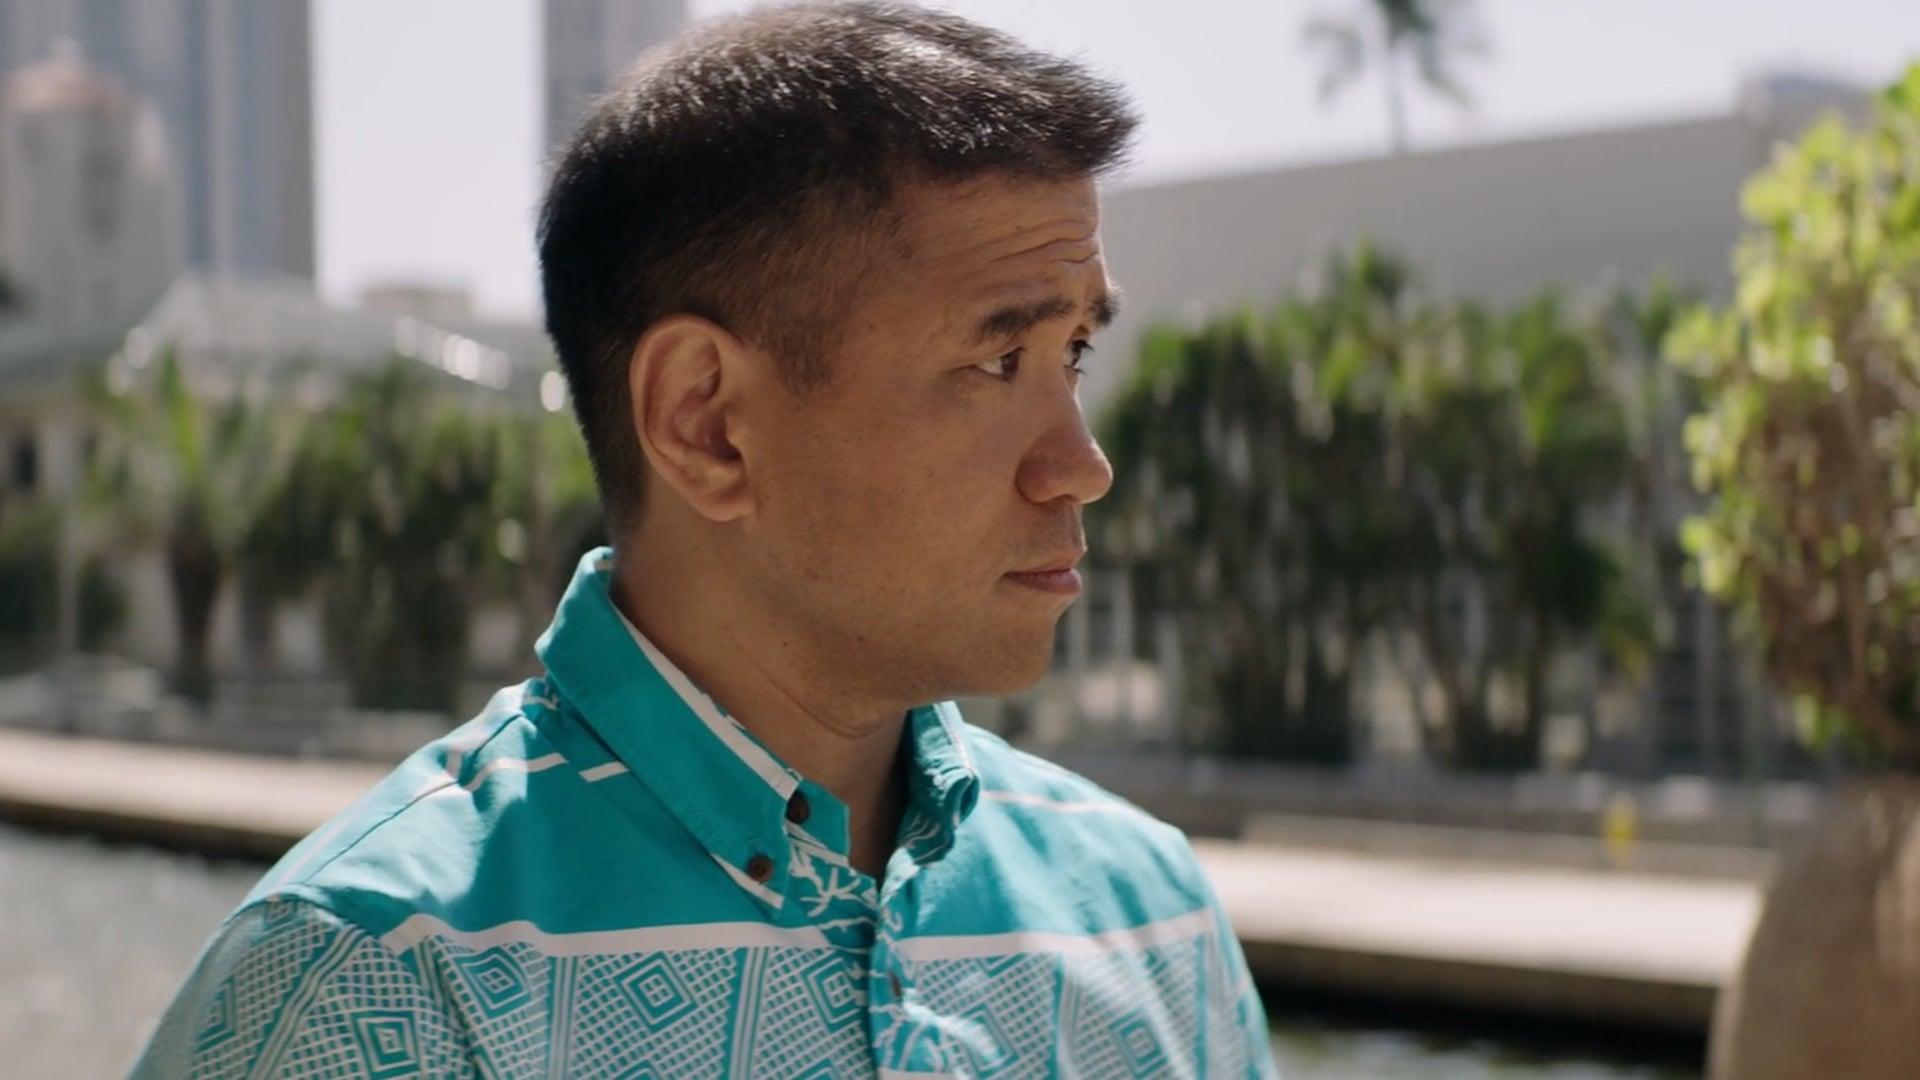 LinkedIn Customer Story - The State of Hawaii